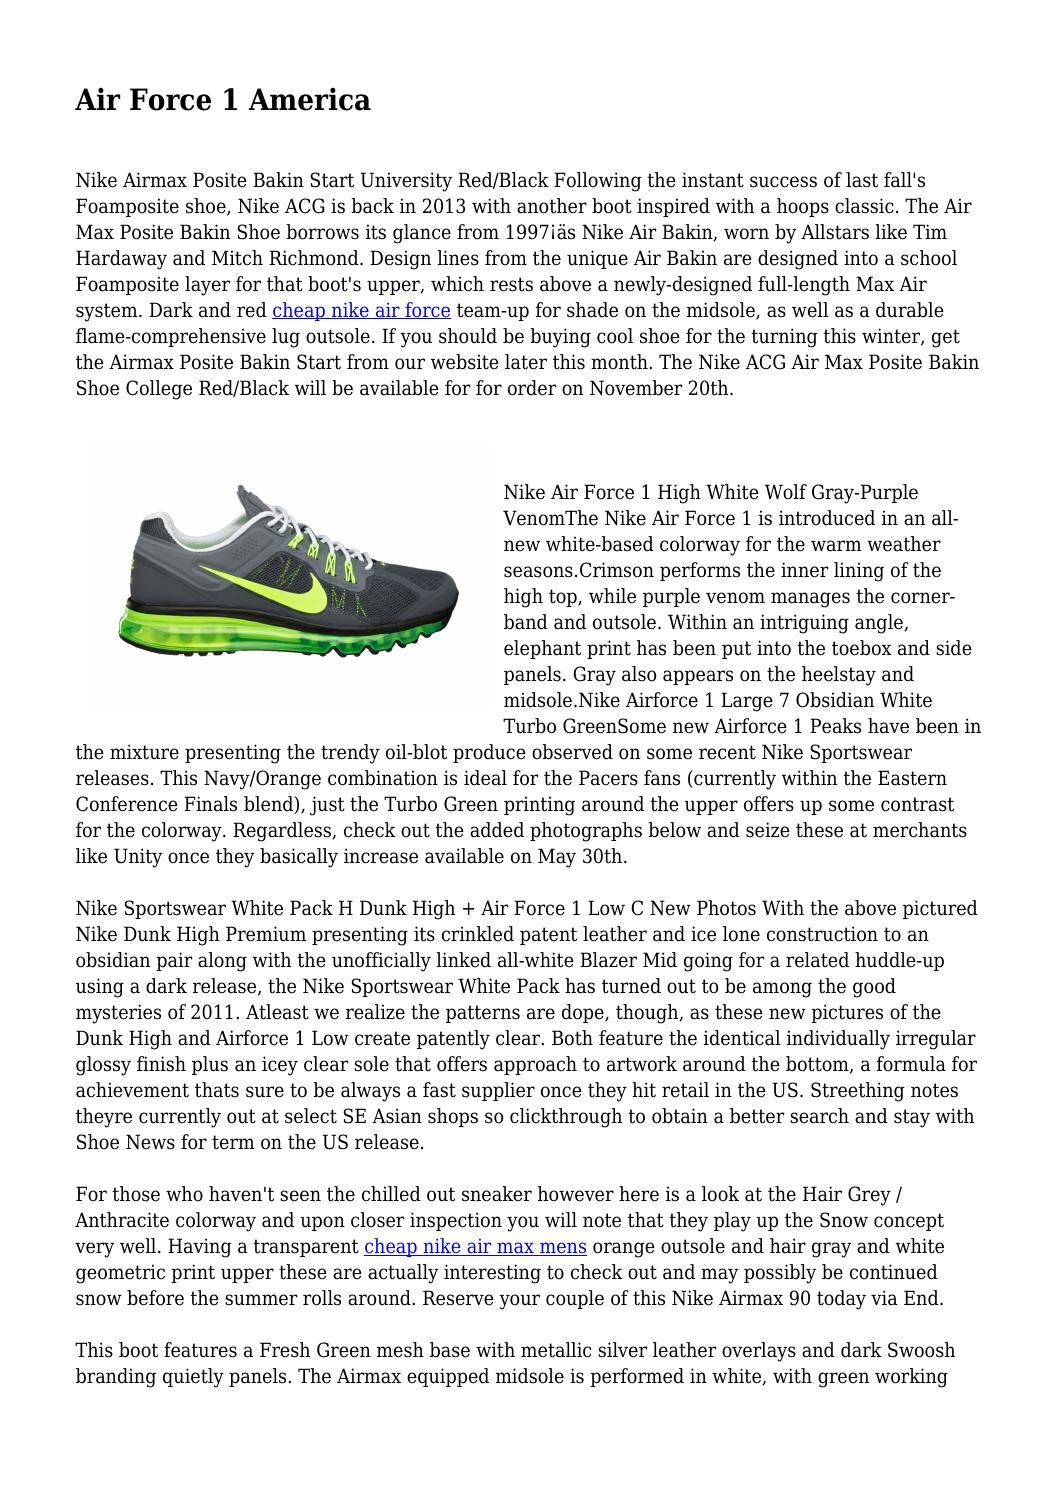 Nike Air Force 1 High ObsidianWhite Turbo Green | Sole